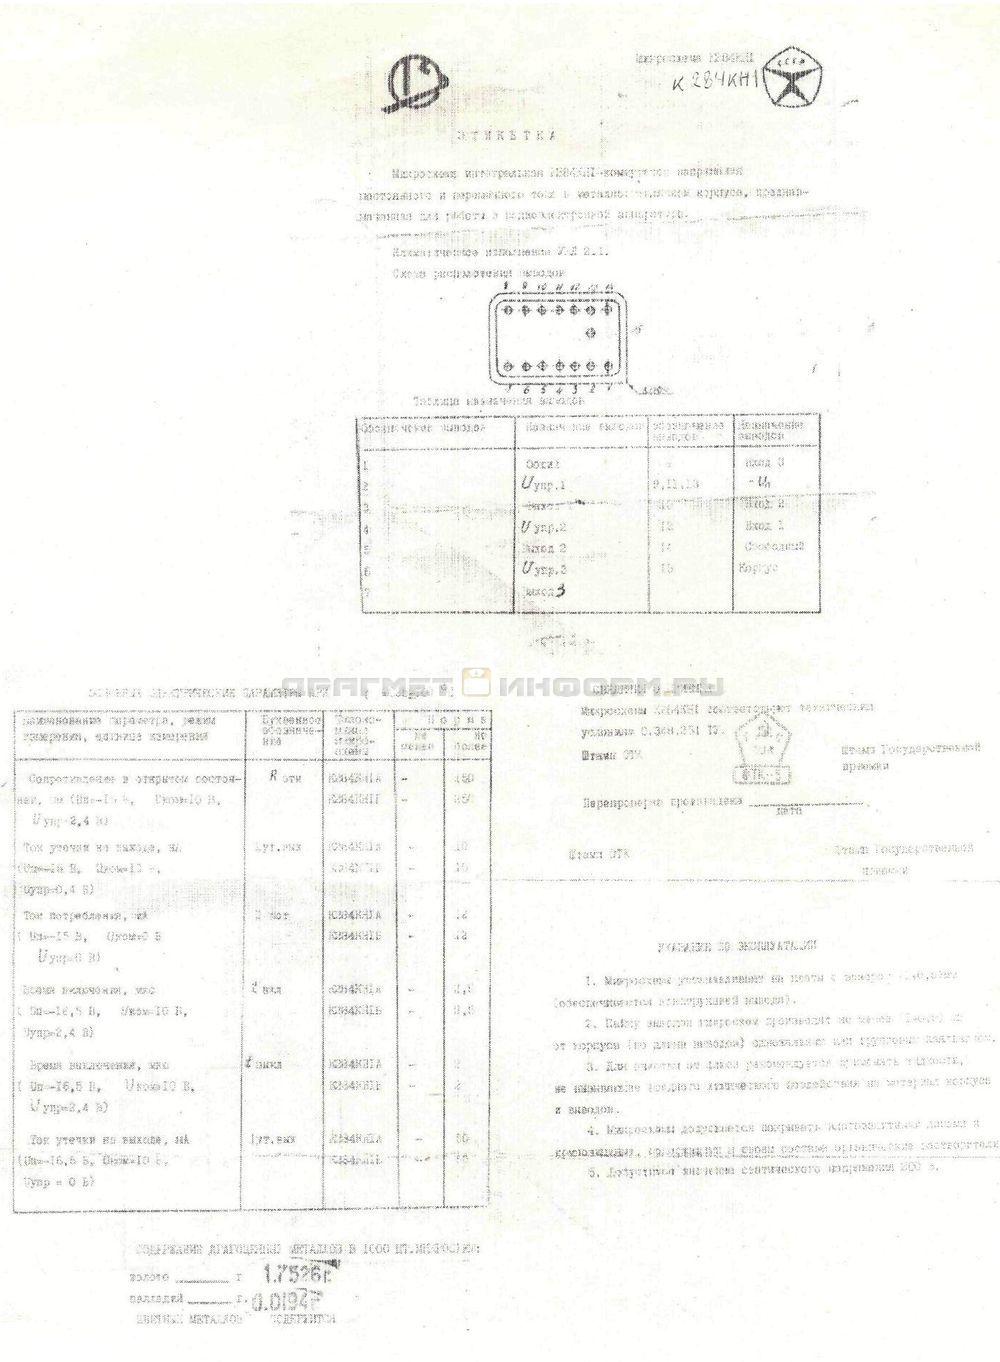 Формуляр К284КН1А